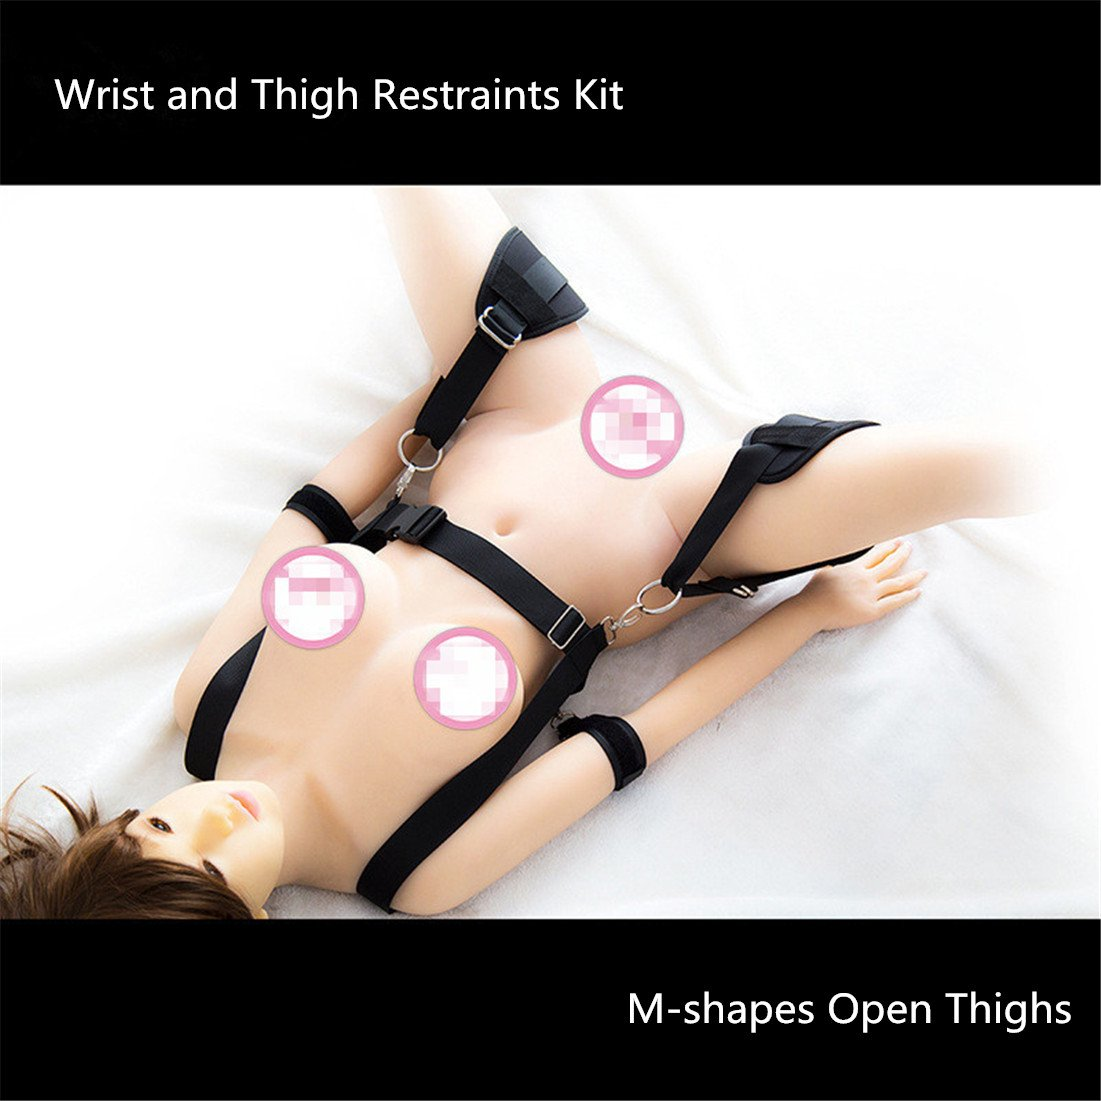 Restraints Kit, Runsmooth Nylon Wrist and Thigh Restraints Belts Couples Role Play Bed Bondage Belts, Black